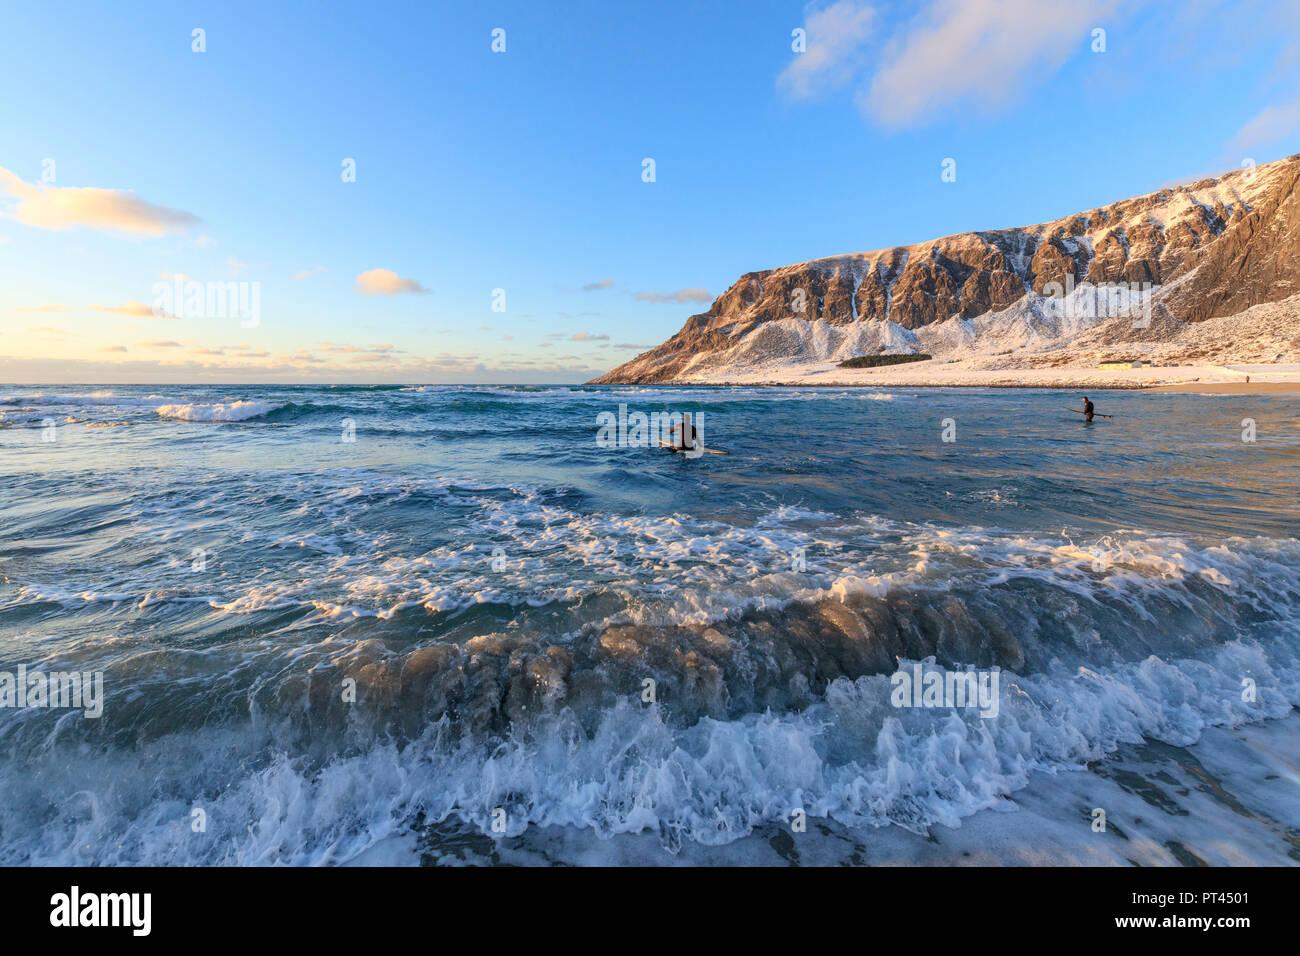 Surfers paddling, Unstad, Vestvagoy, Lofoten Islands, Norway - Stock Image